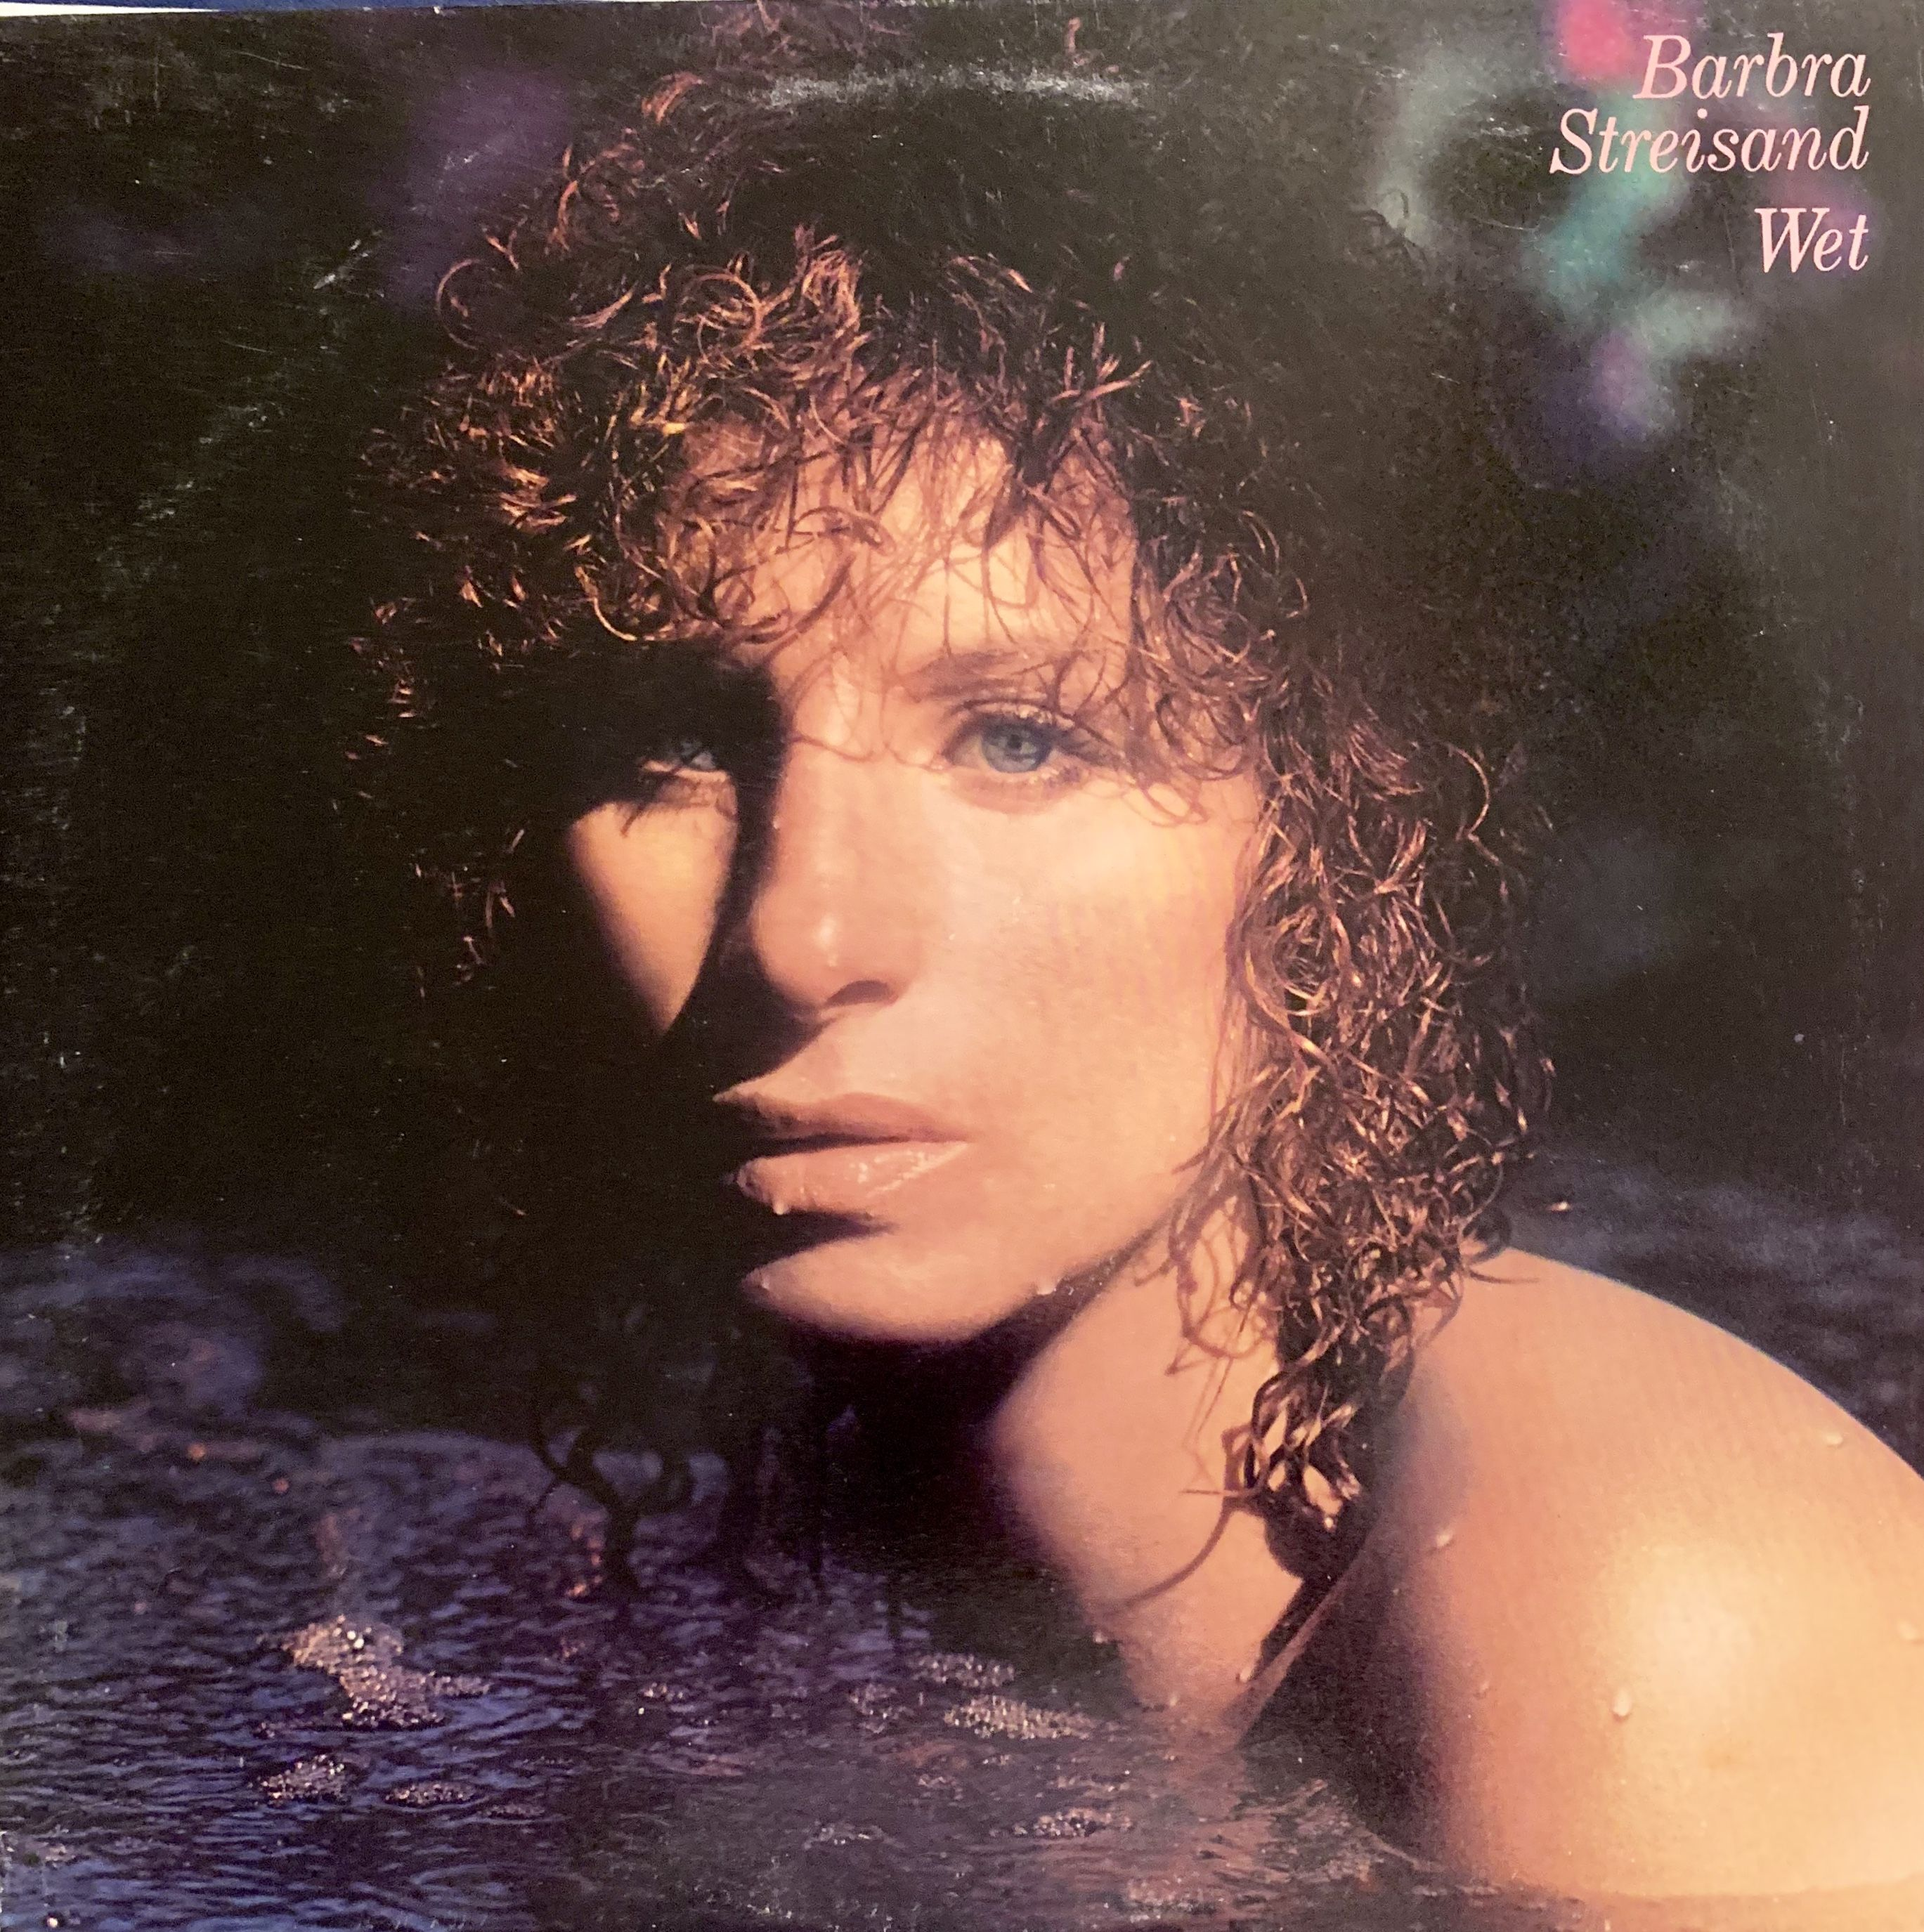 Pin By Roy Vieregge On Album Covers Barbra Streisand Barbra